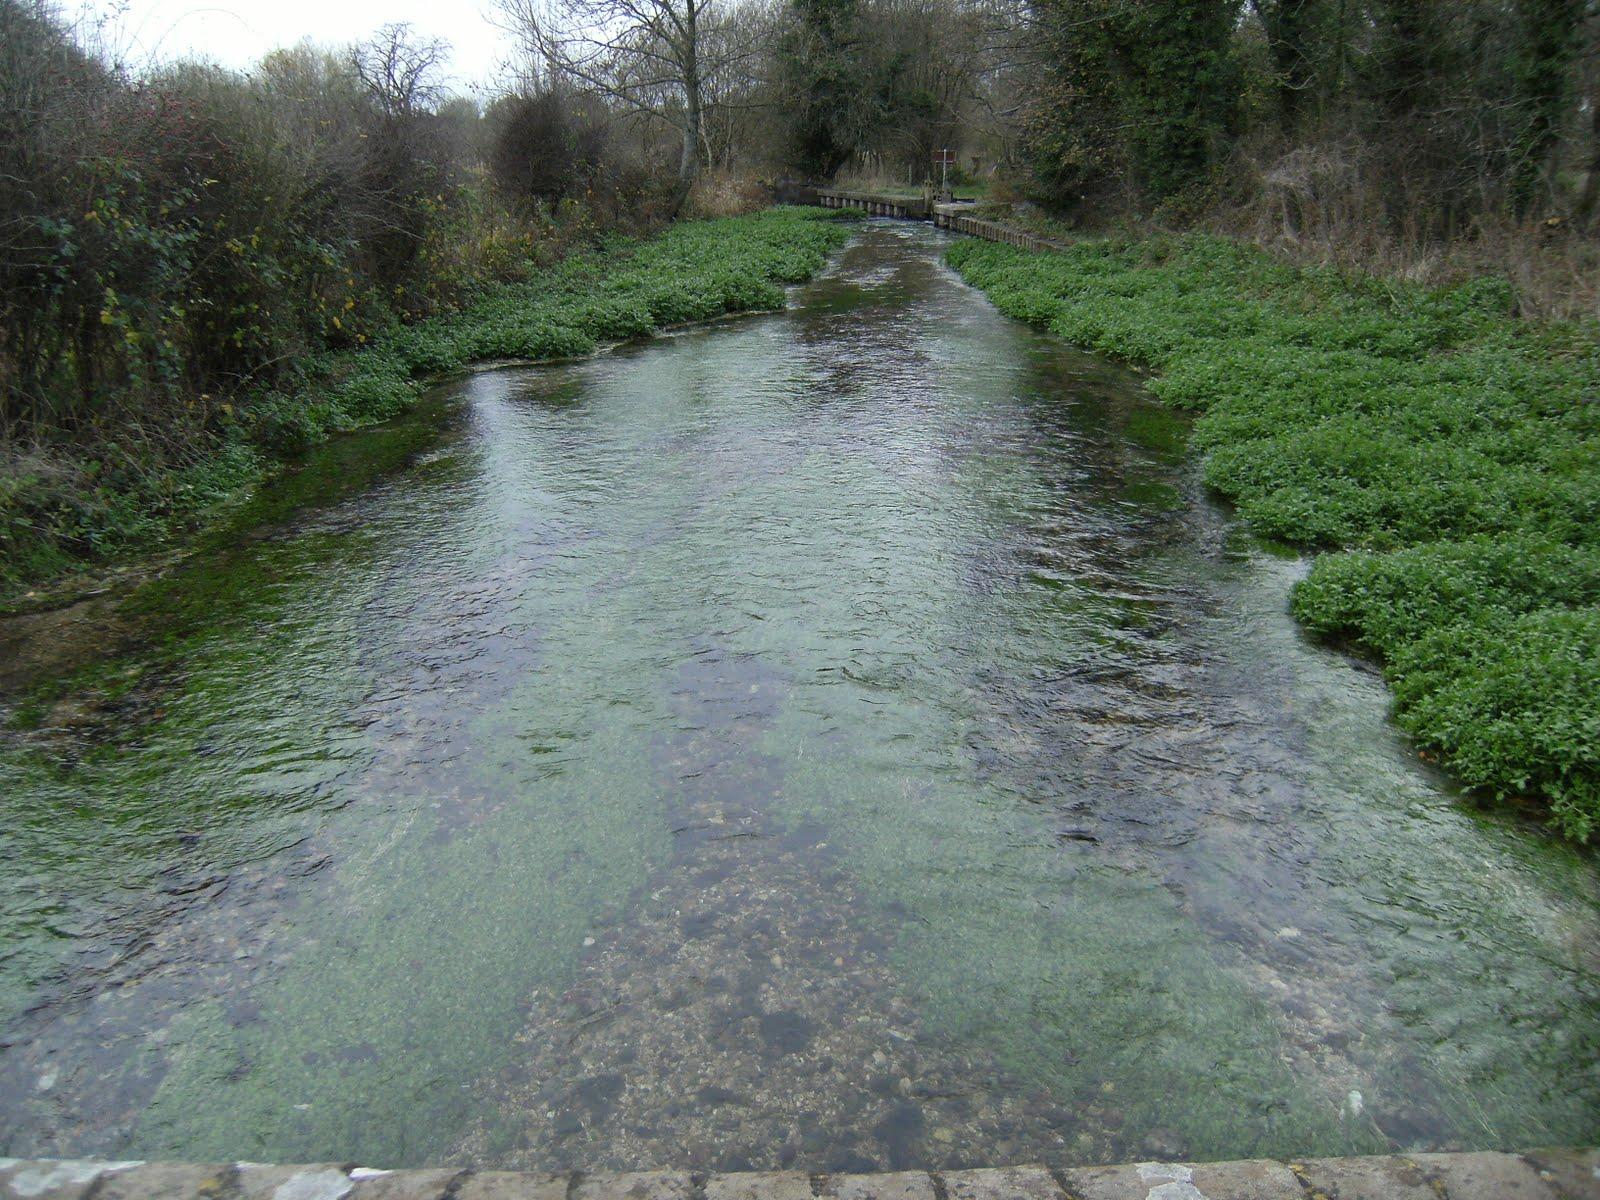 DSCF2709 River Test at Freefolk